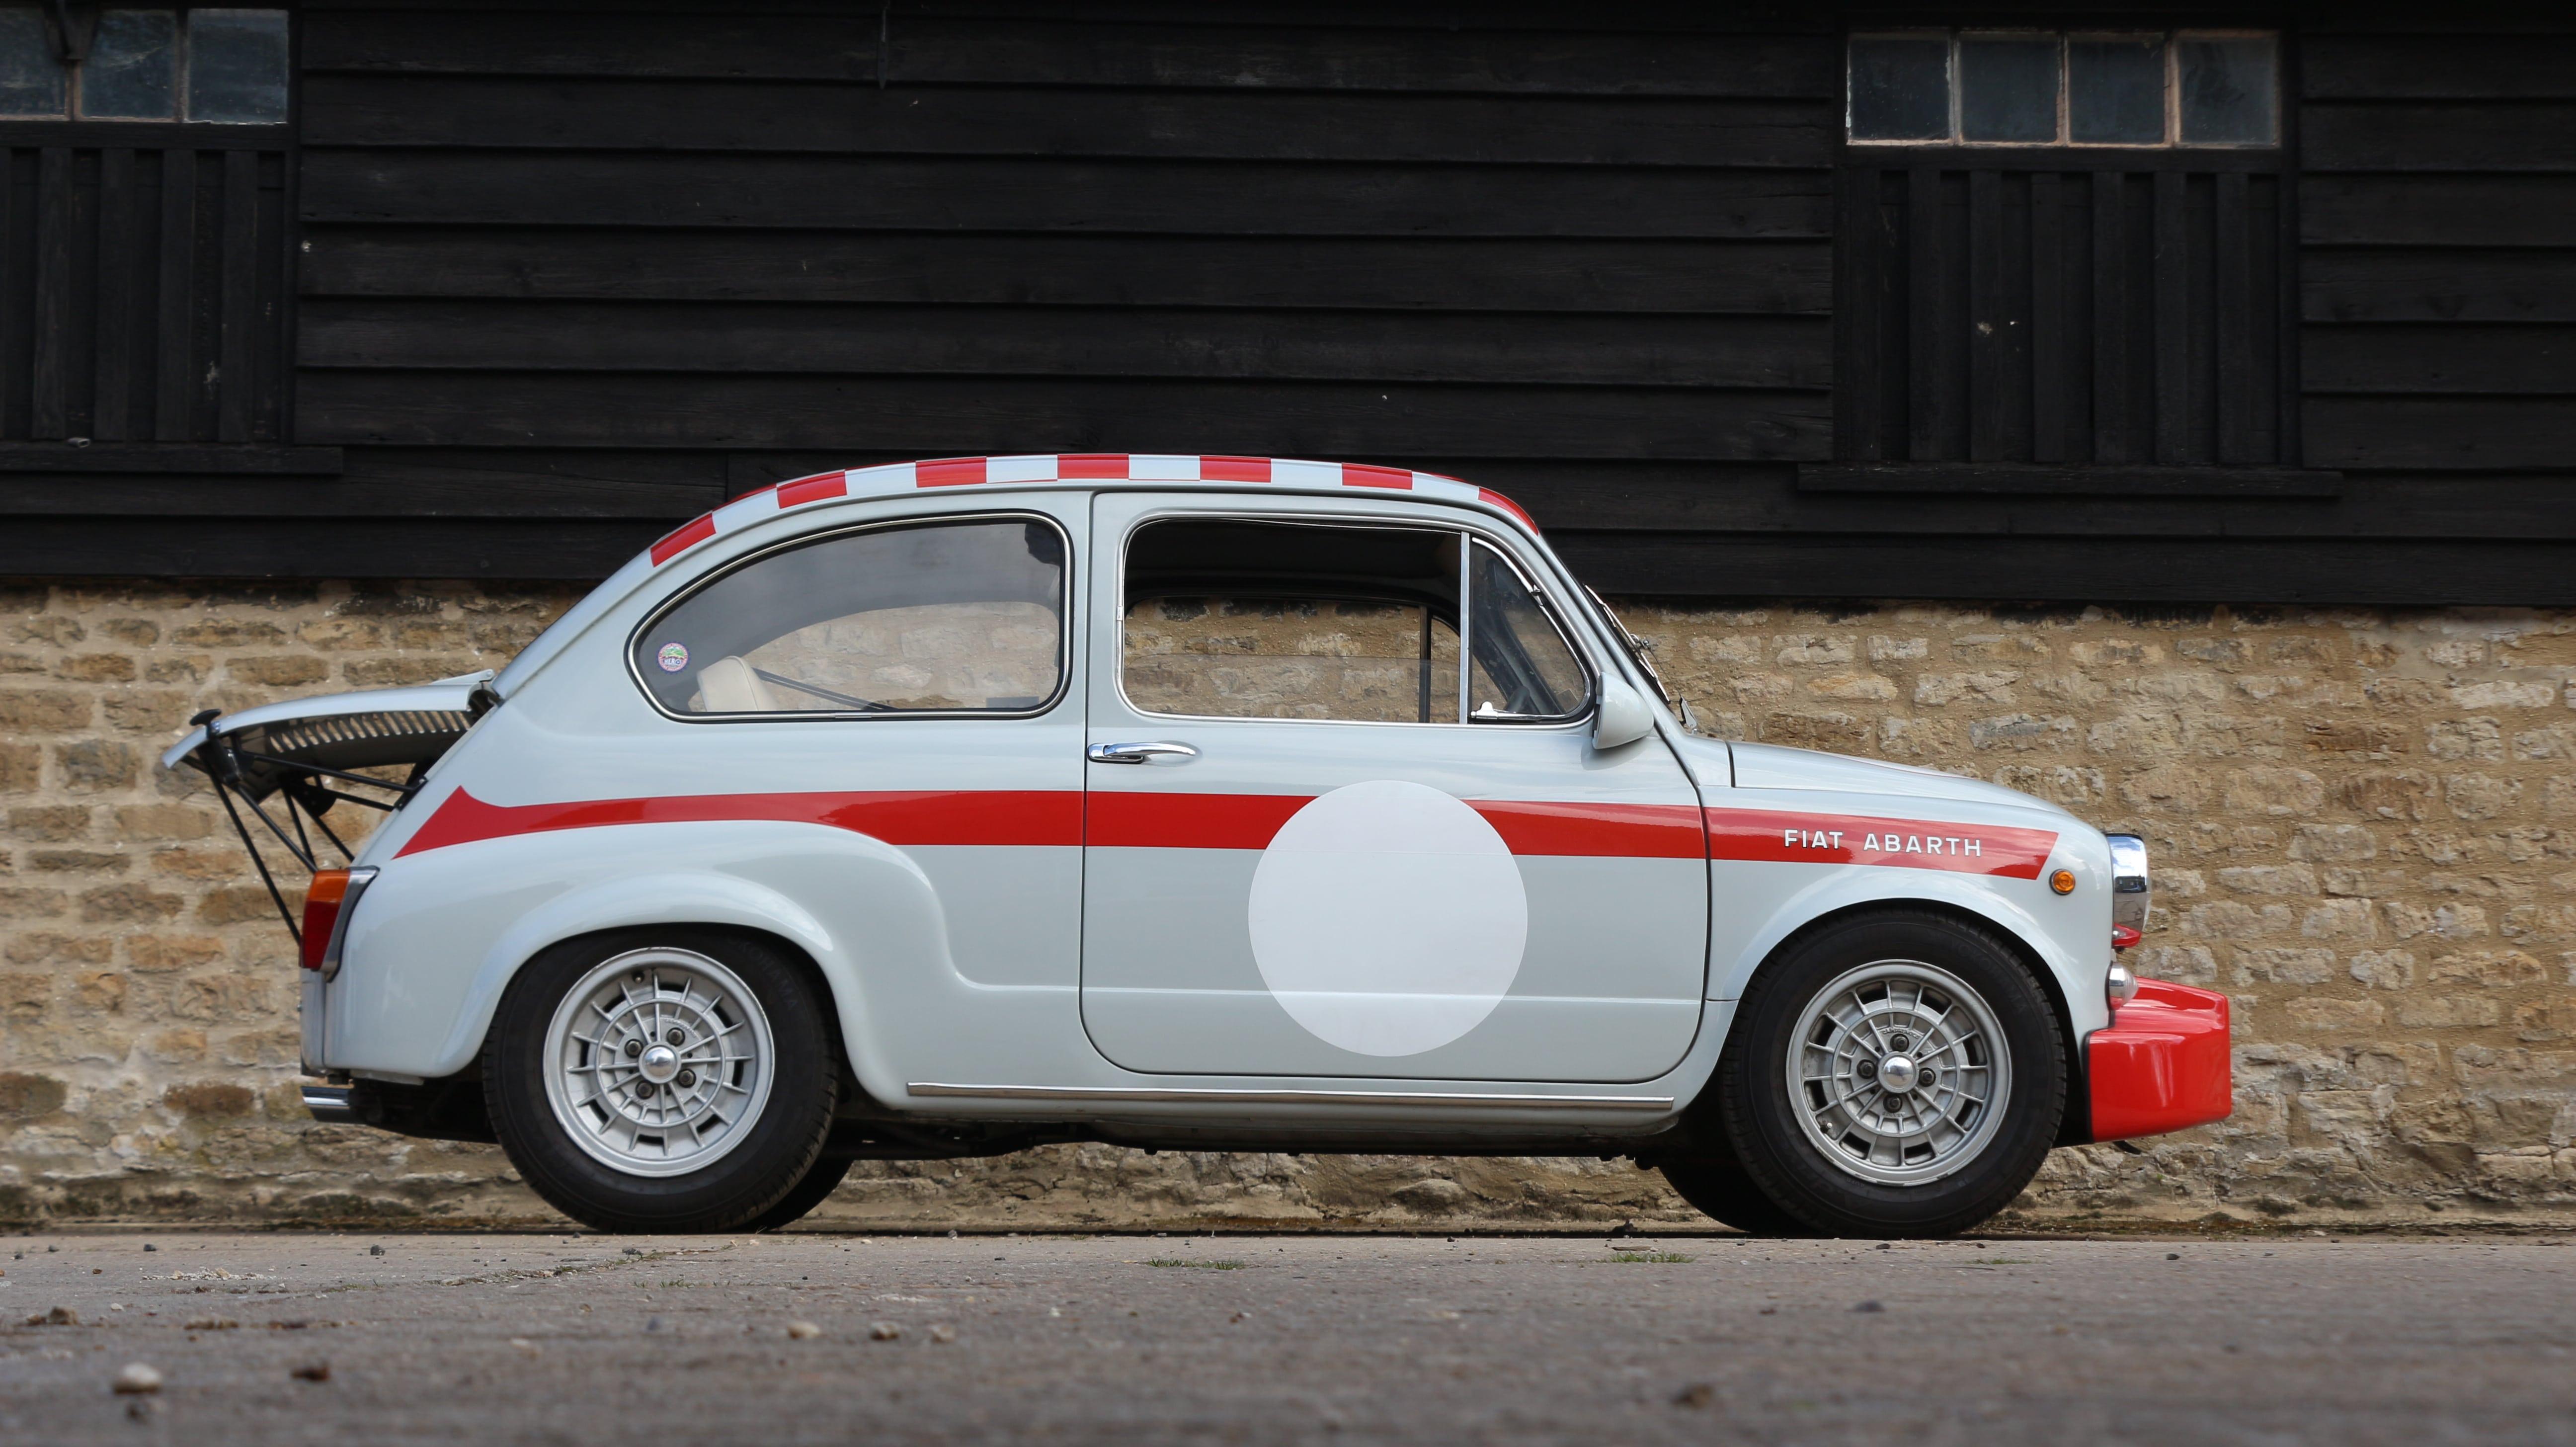 FIAT ABARTH 1000 BERLINA CORSA | Fiat 500 and Clic Abarth ...